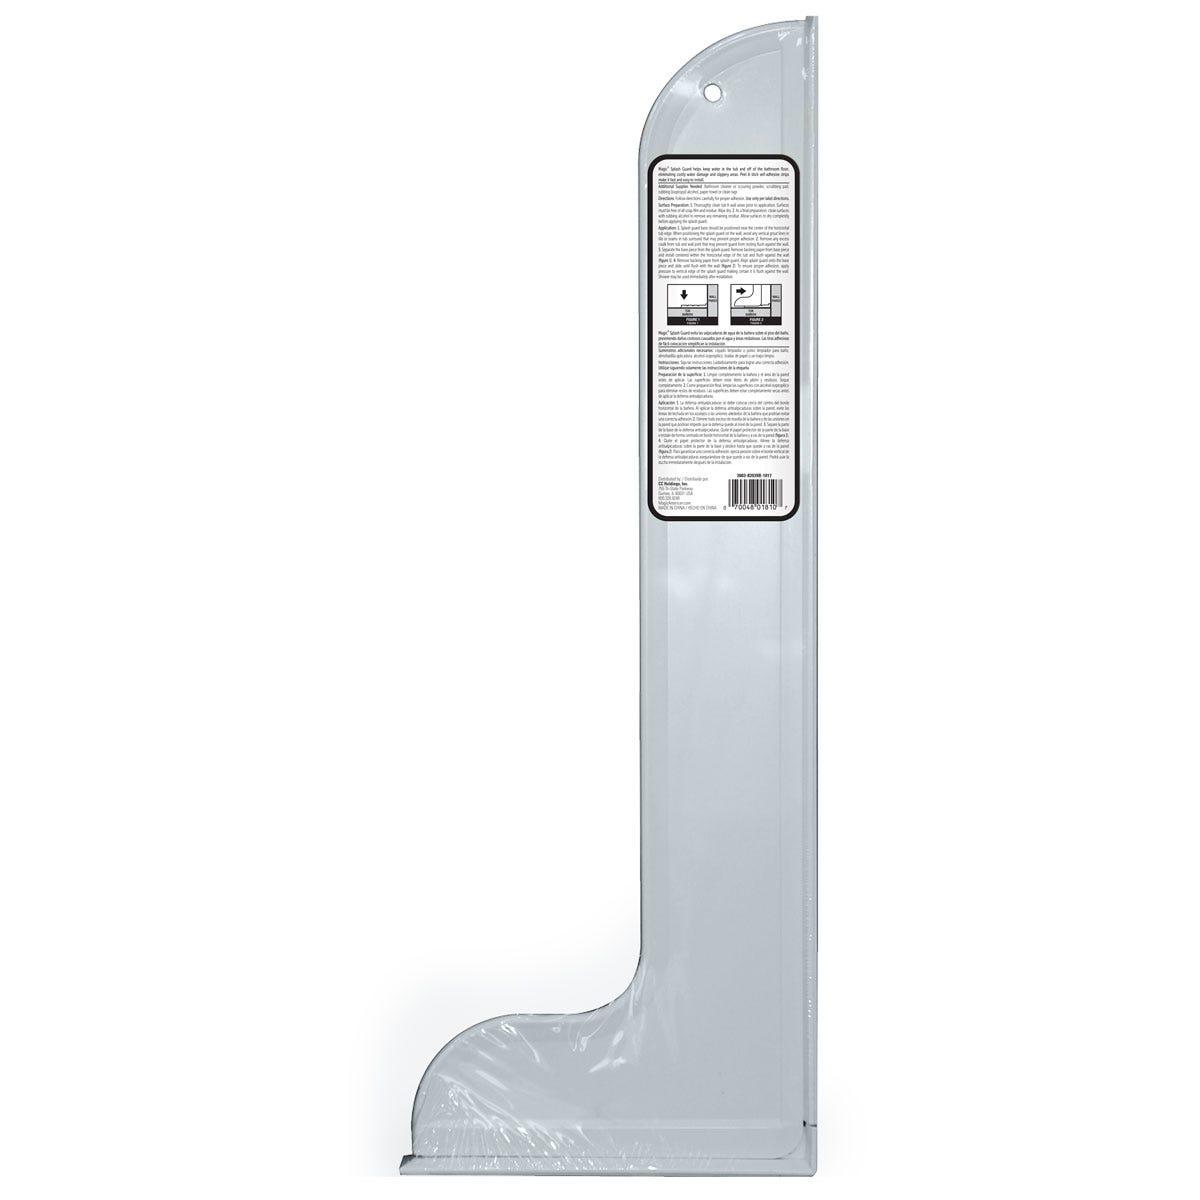 https://googone.com/media/catalog/product/l/a/large-splash-guard_back.jpg